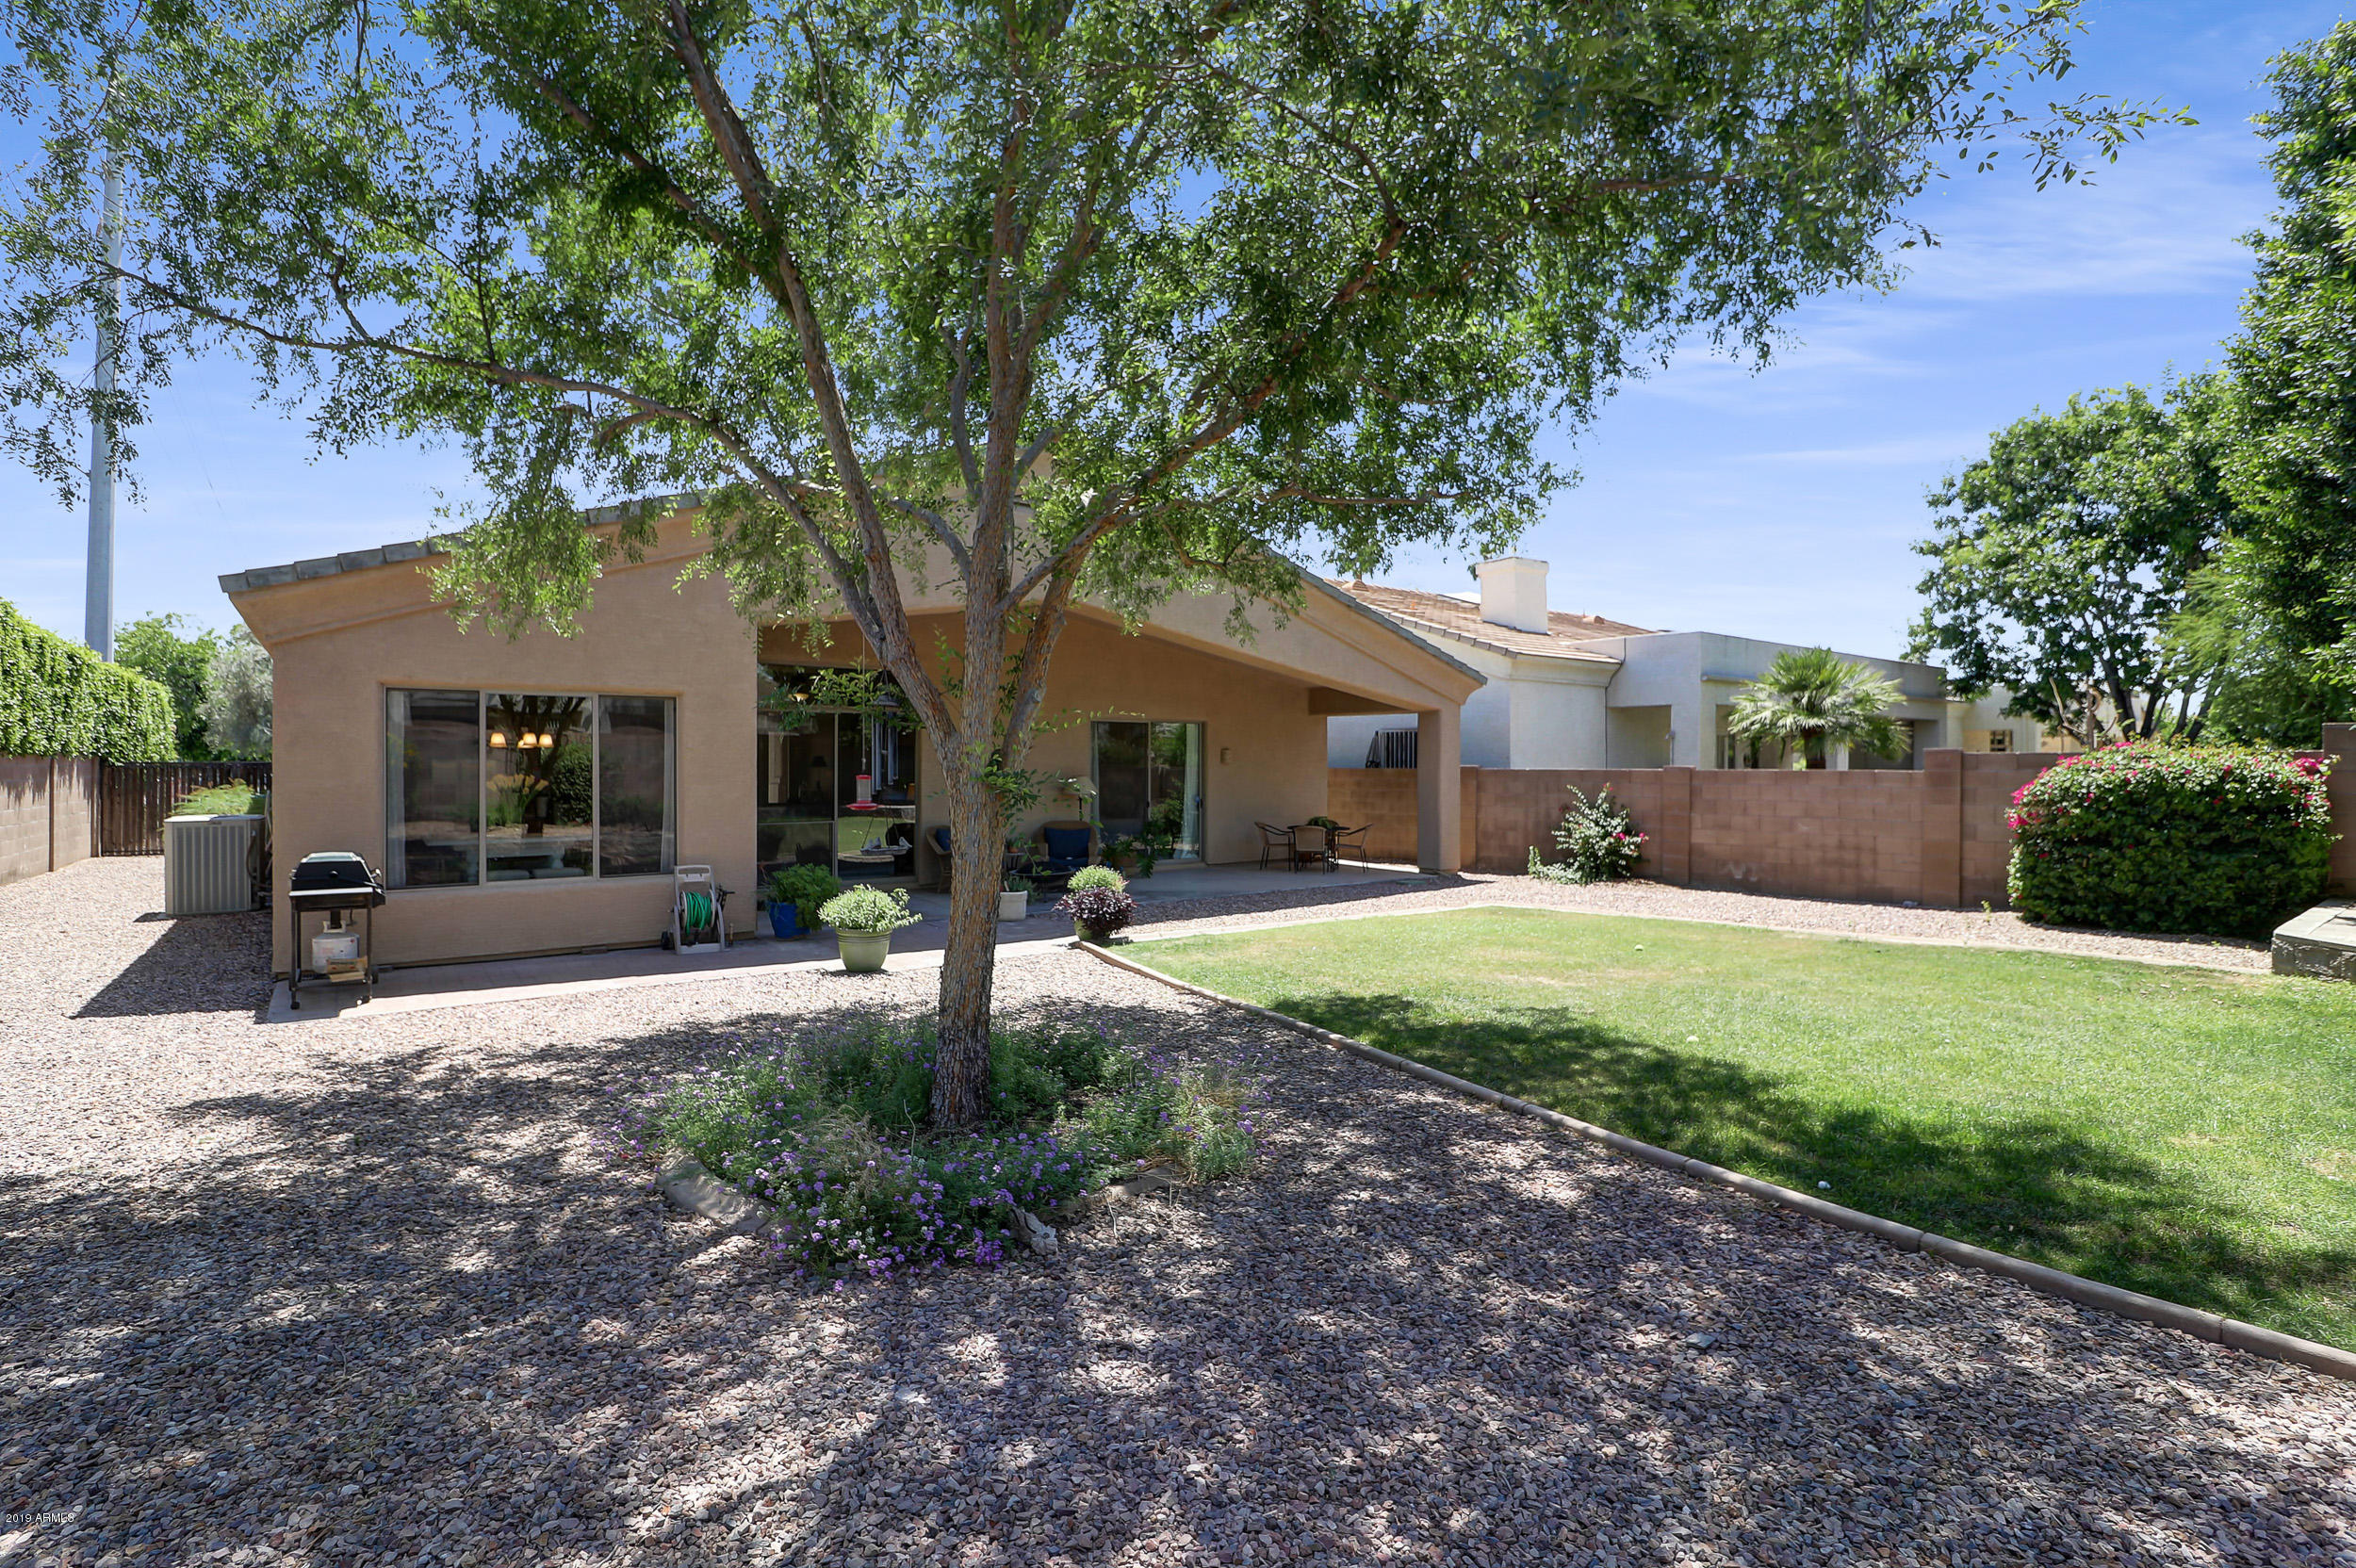 1160 E Mclellan Boulevard, Phoenix, AZ 85014 - SOLD LISTING, MLS # Zacher Homes Floor Plans on keller homes, zeman homes, johnson homes, alexander homes, schultz homes, schneider homes,